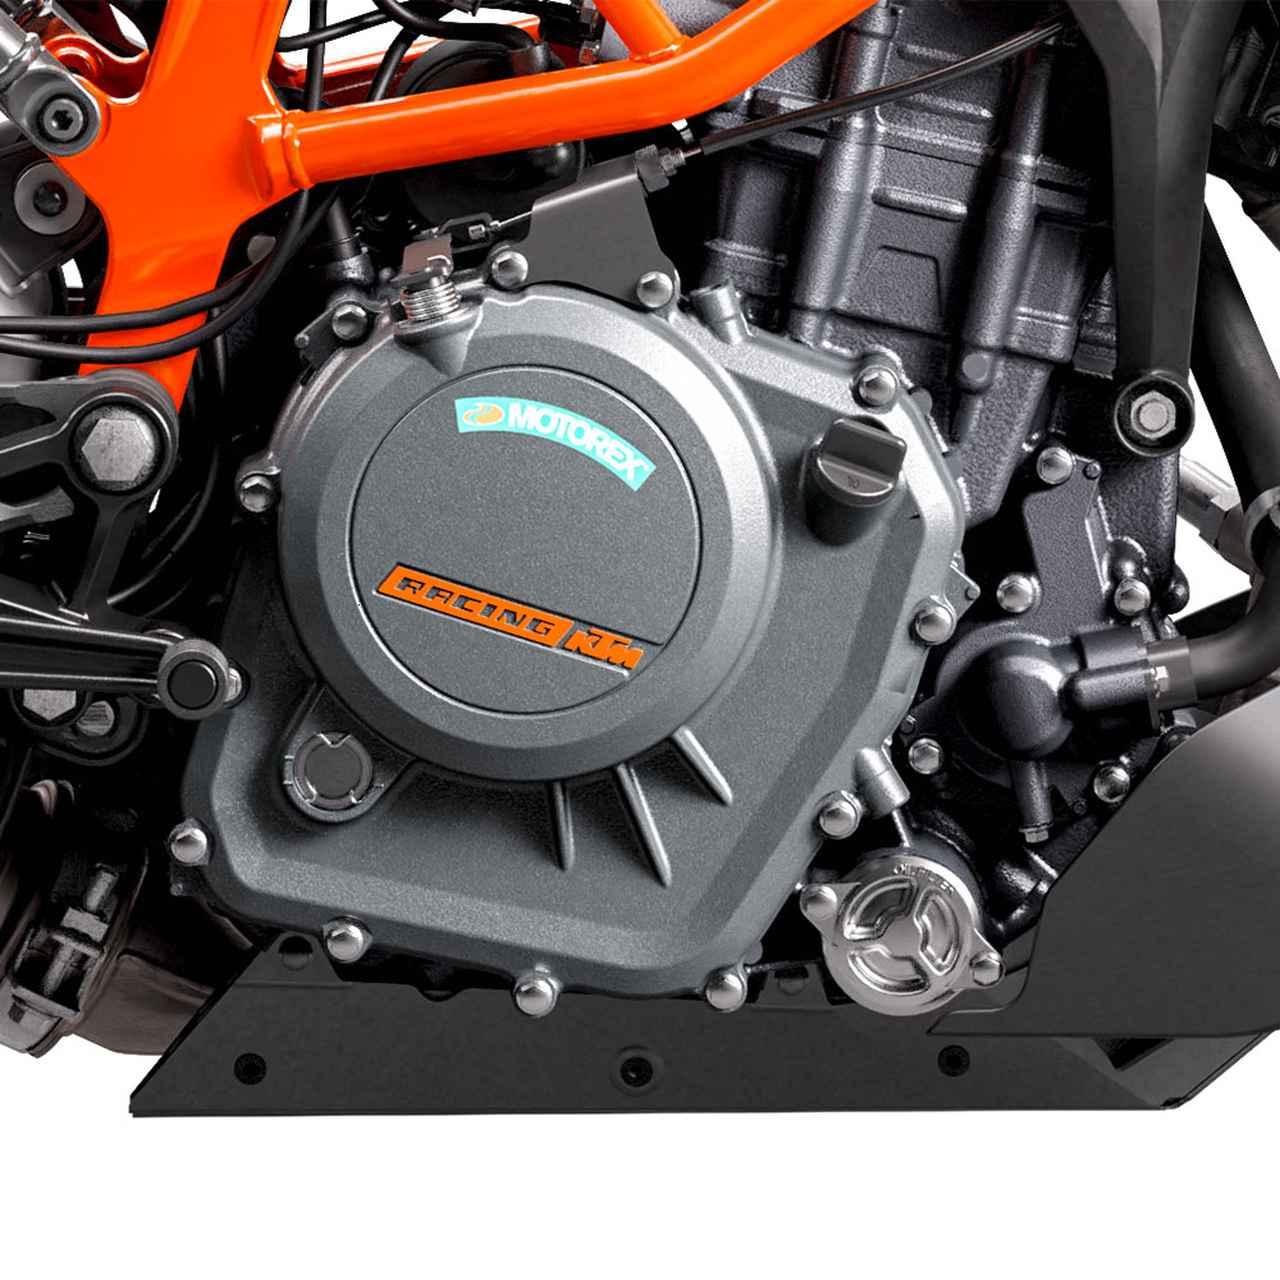 Images : 10番目の画像 - 【写真20枚】KTM「250 デューク」 - webオートバイ